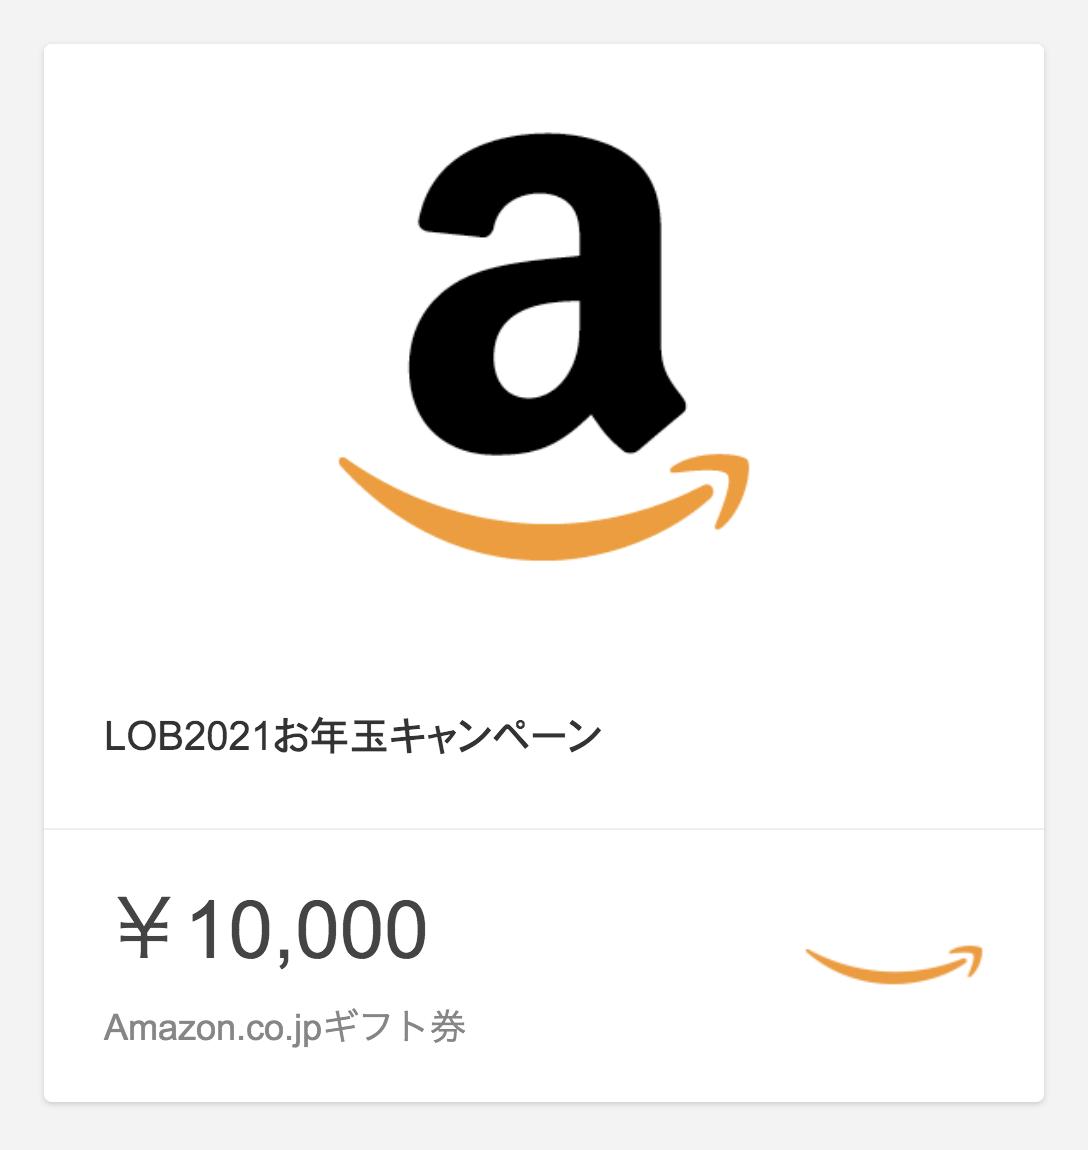 LOB2021ギフト券